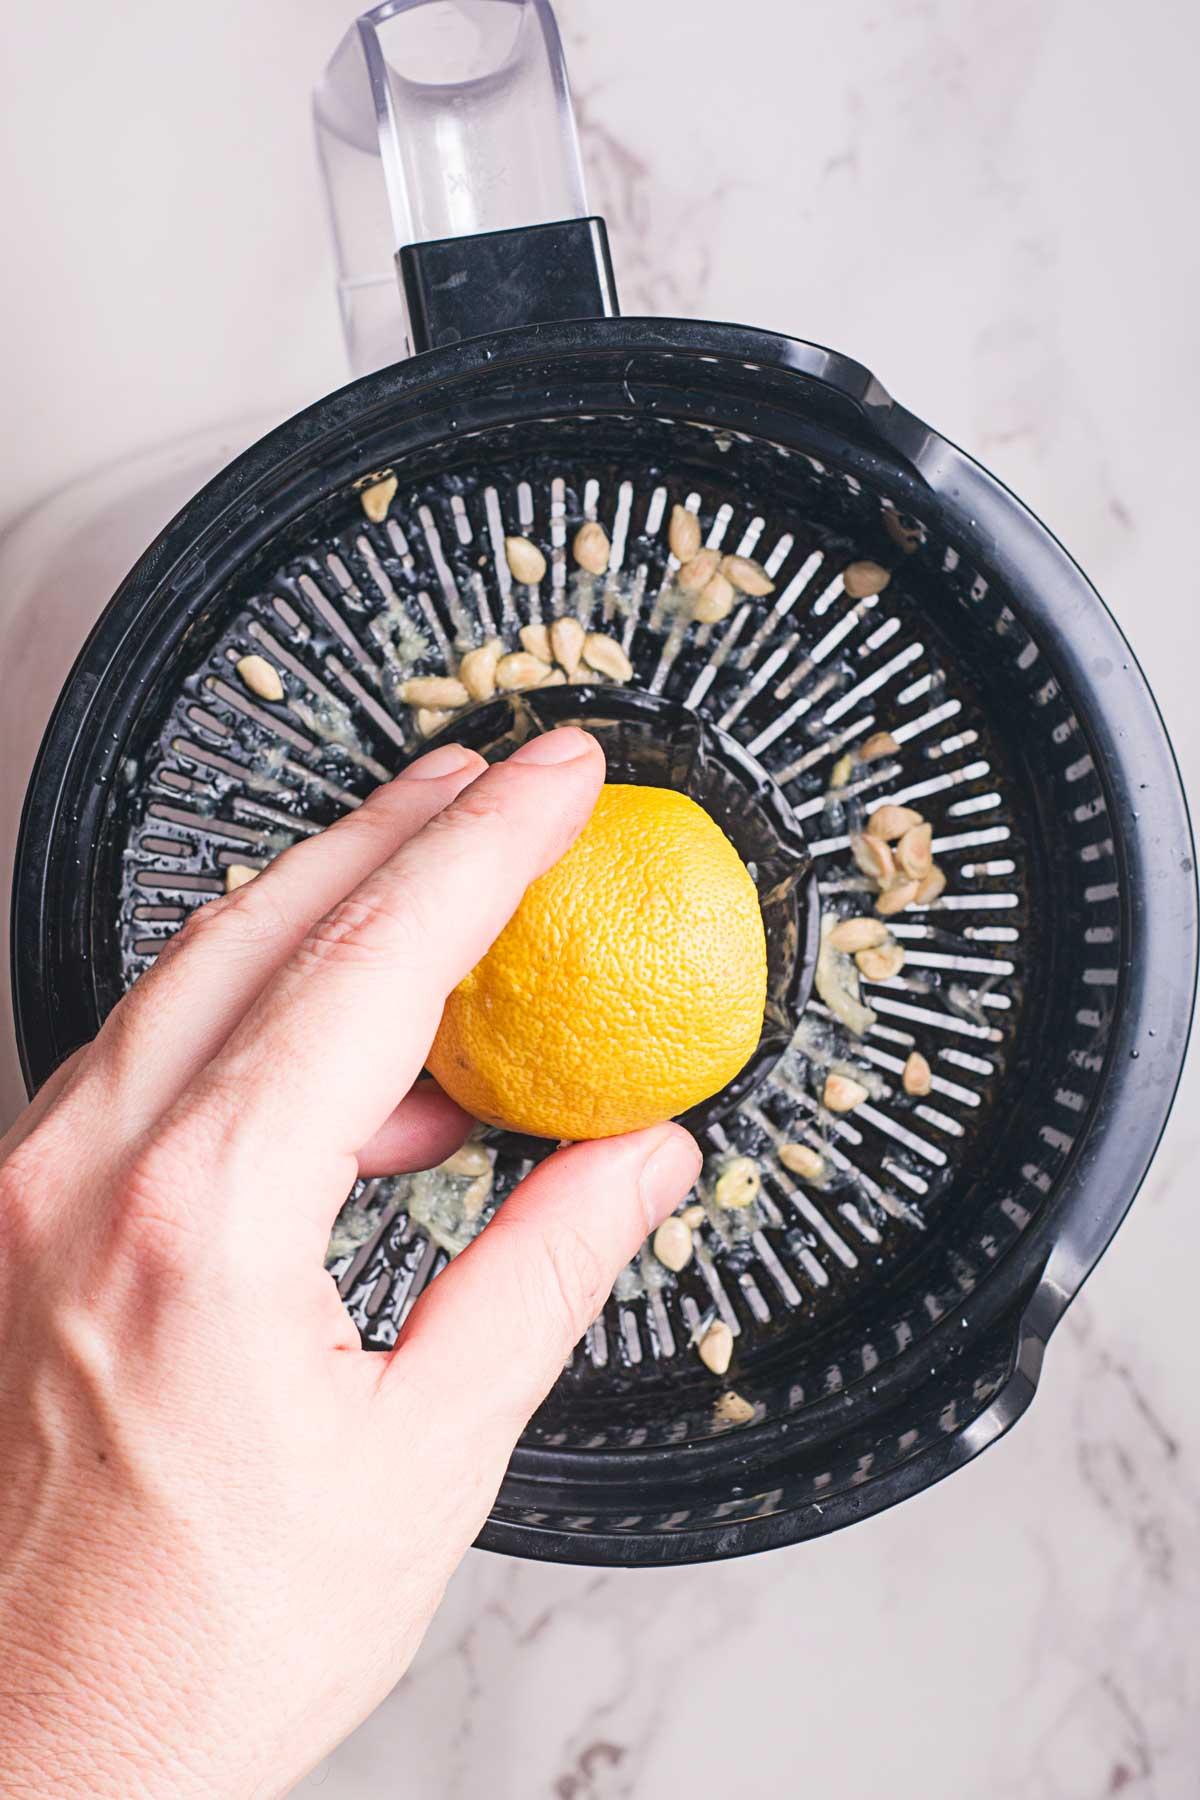 hand juicing a lemon on a juicer